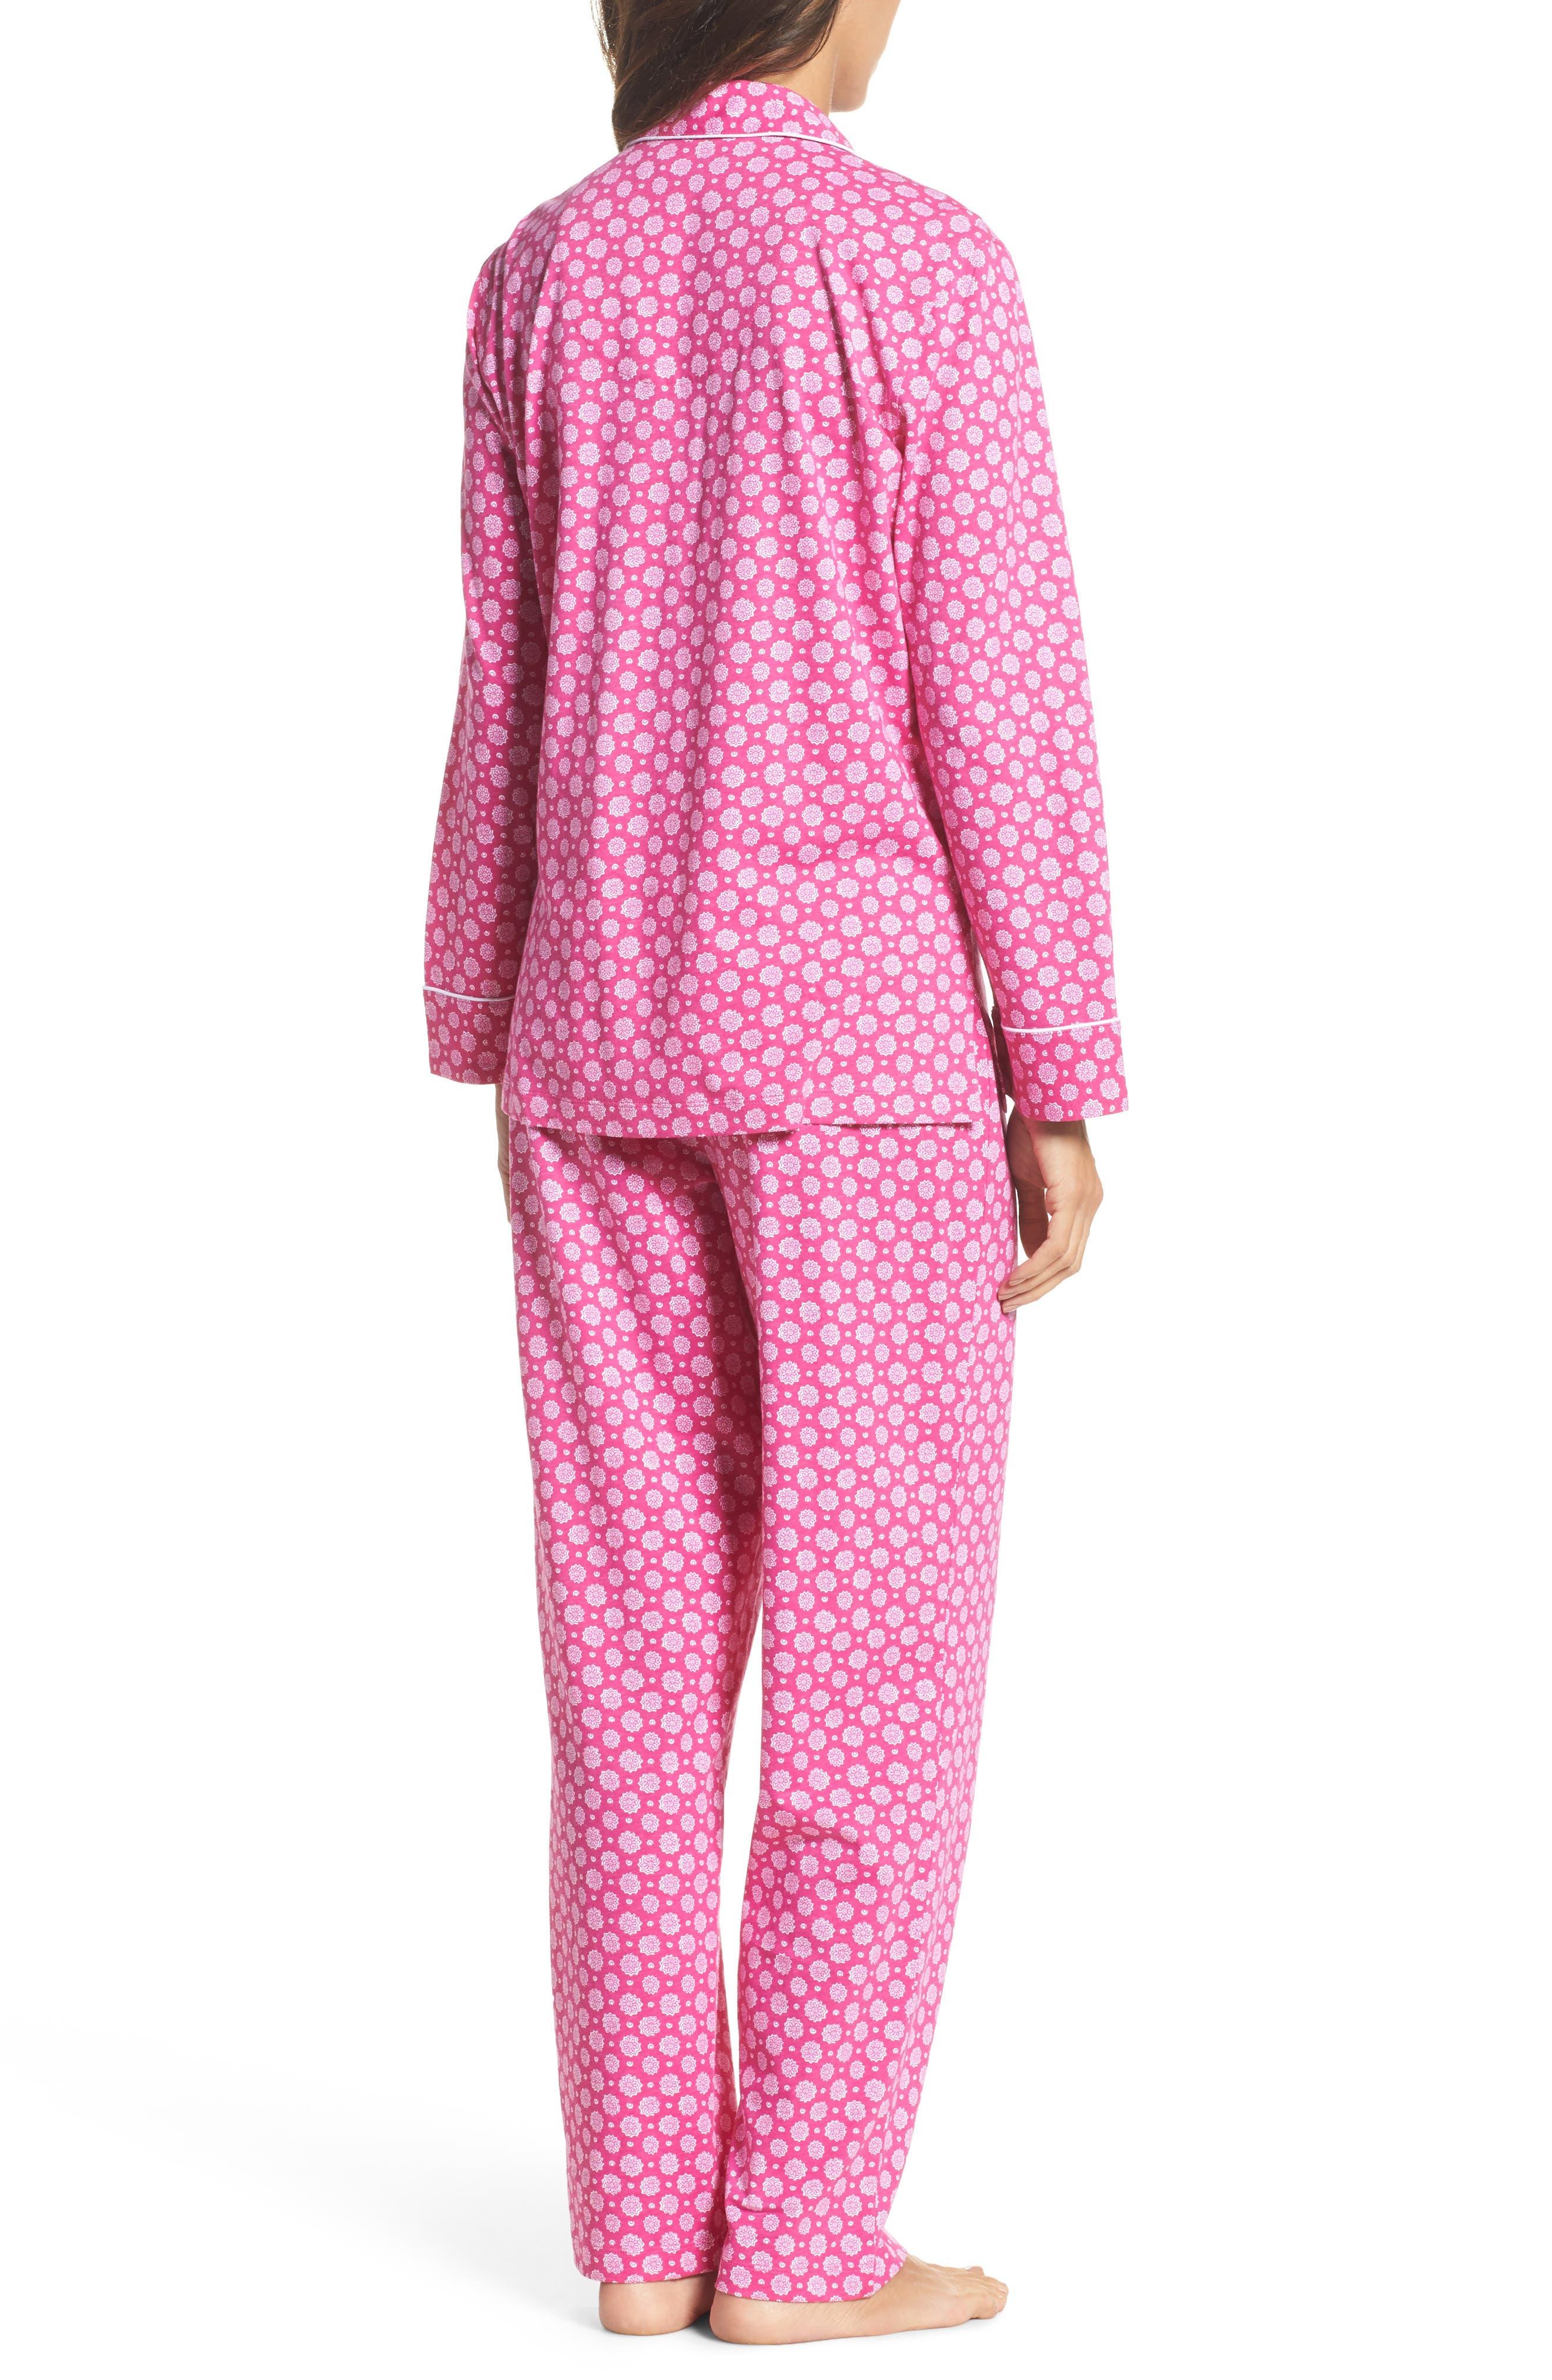 Notch Collar Pajamas,                             Alternate thumbnail 2, color,                             Pink Floral